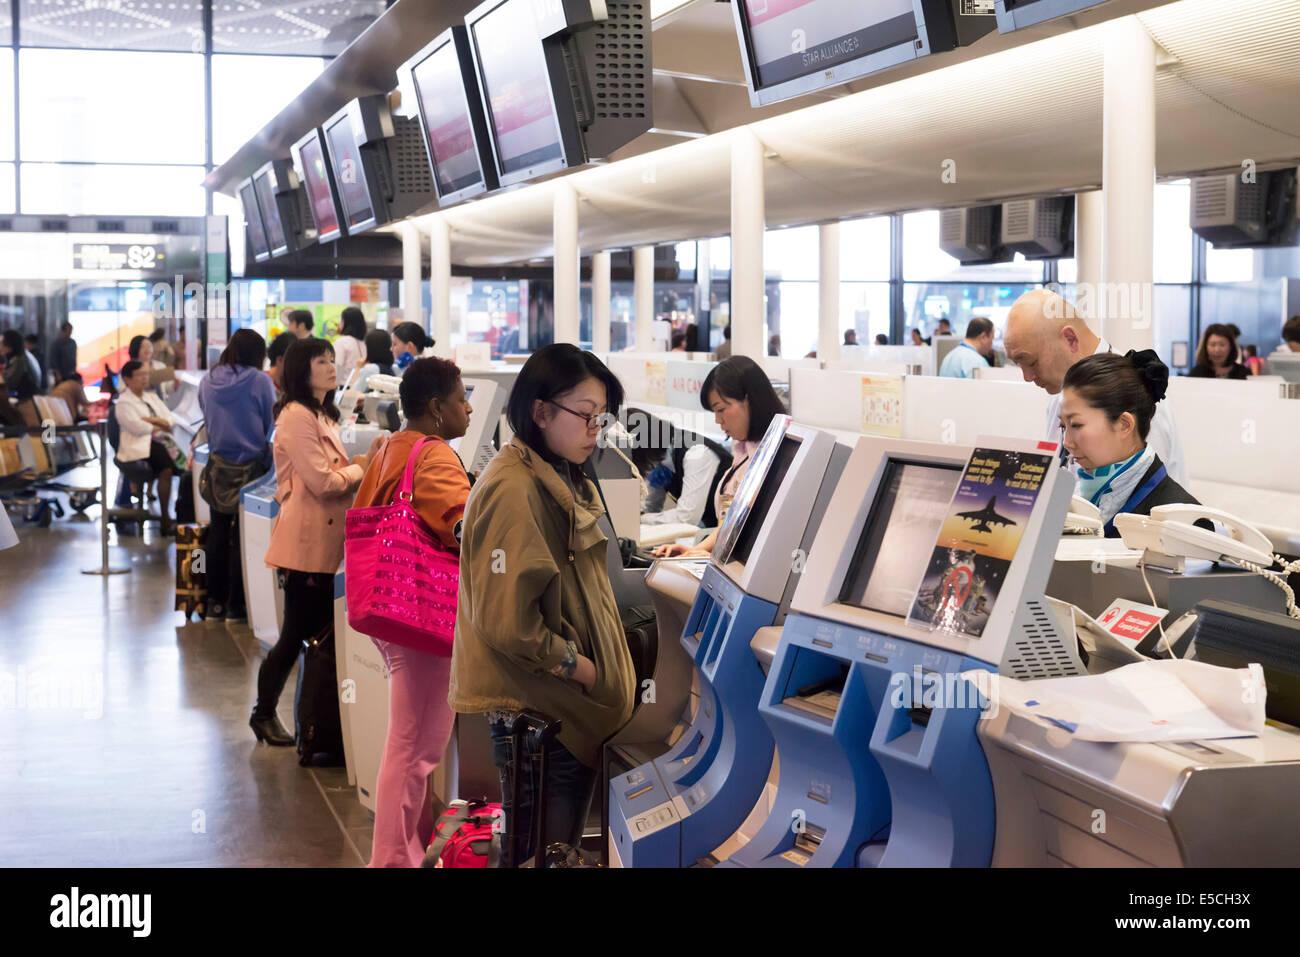 People at Air Canada check-in counter of Narita International Airport in Japan - Stock Image